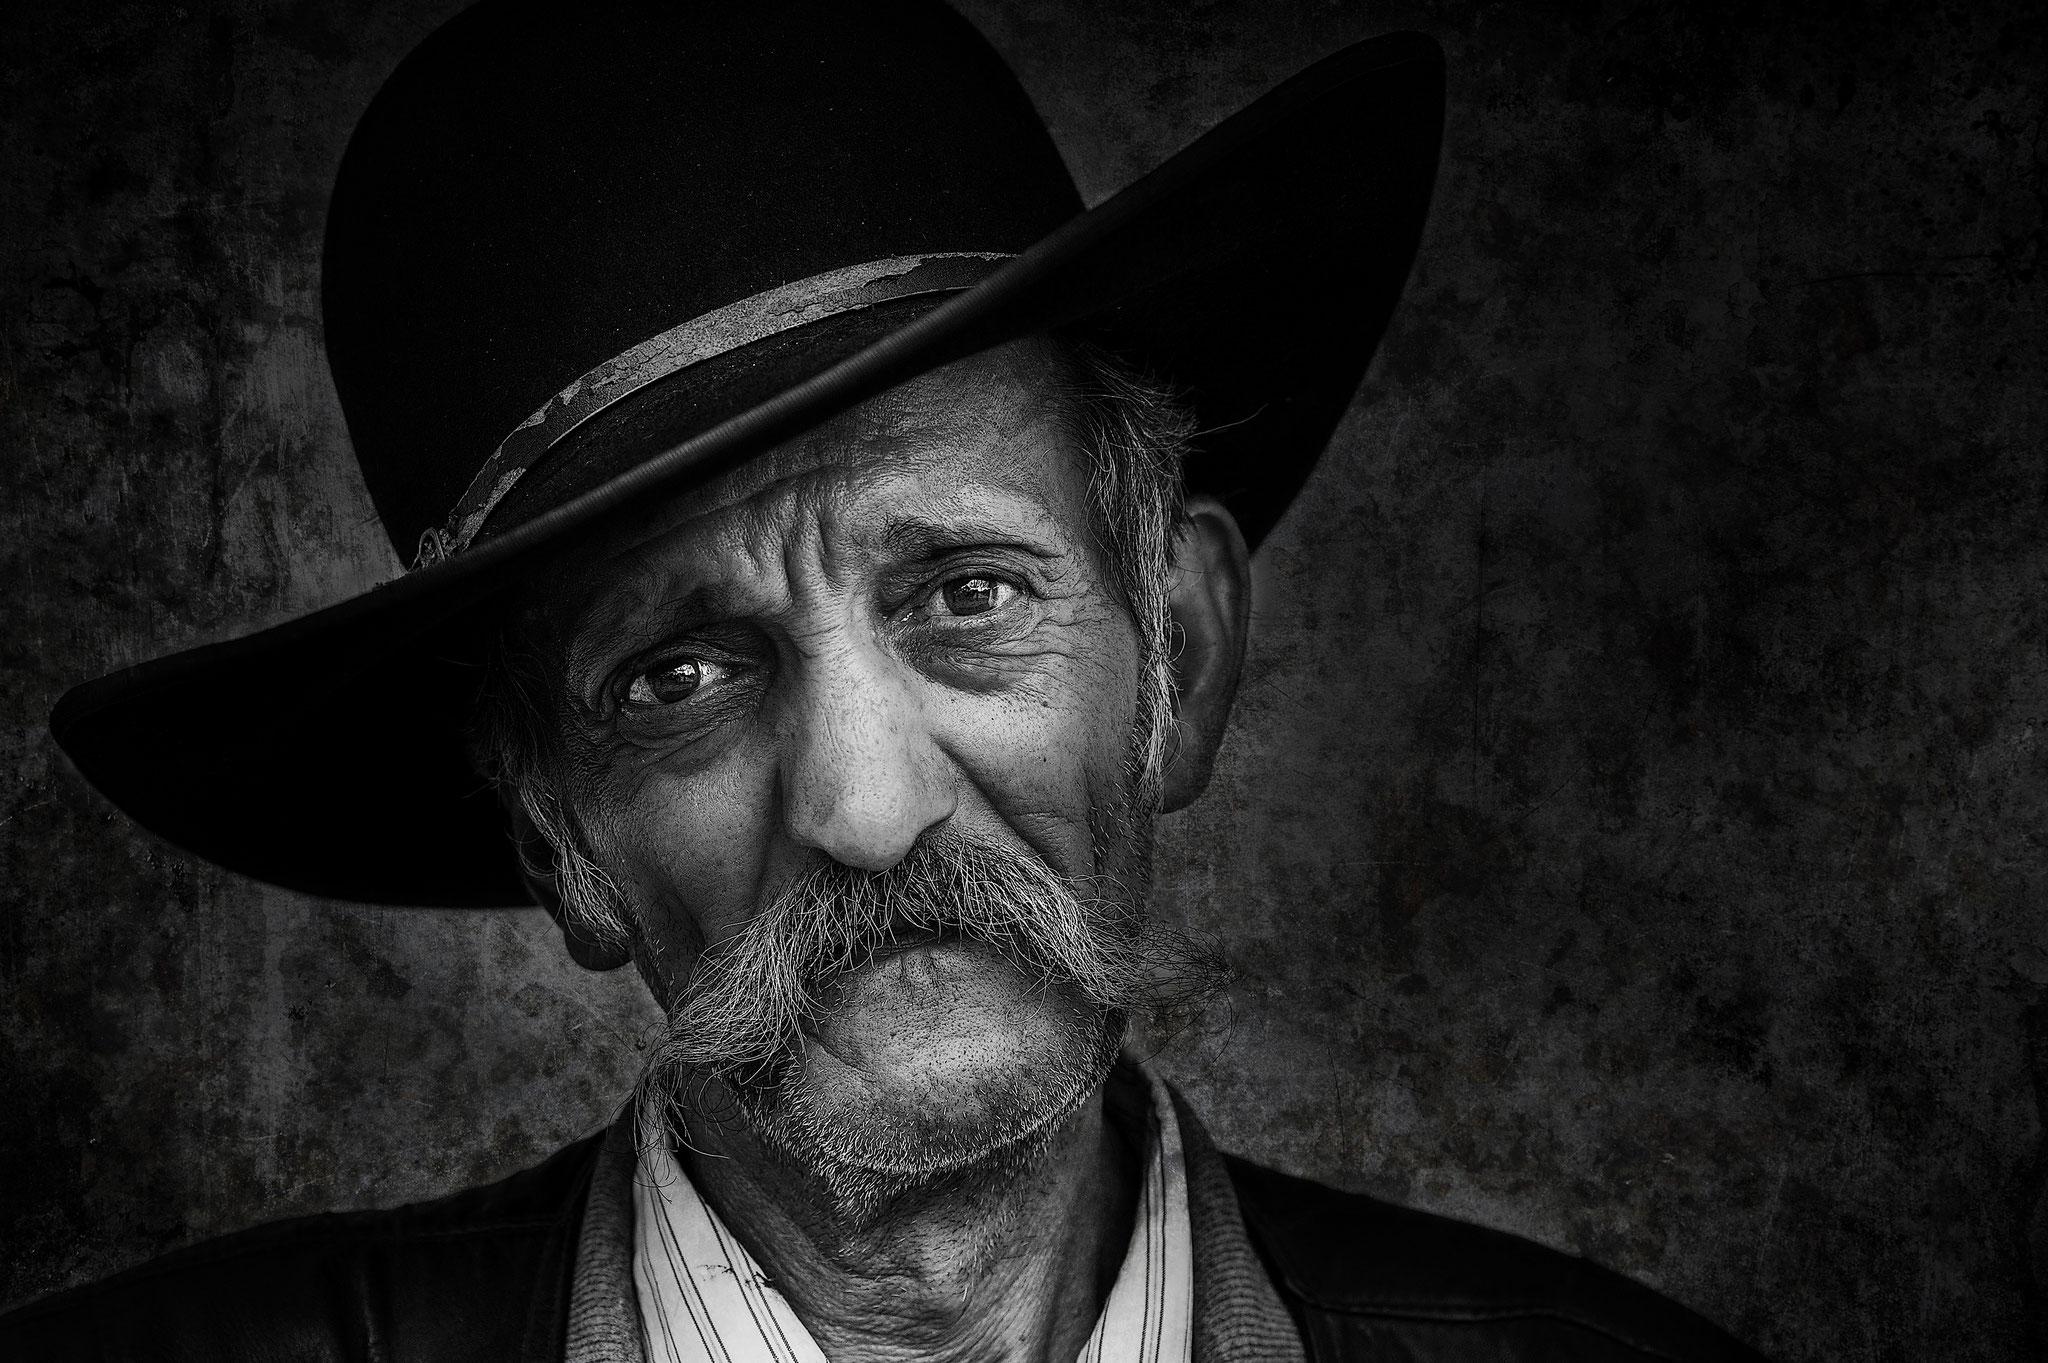 Zelko Csilla EFIAPg (Hungary) -Expressive Eyes